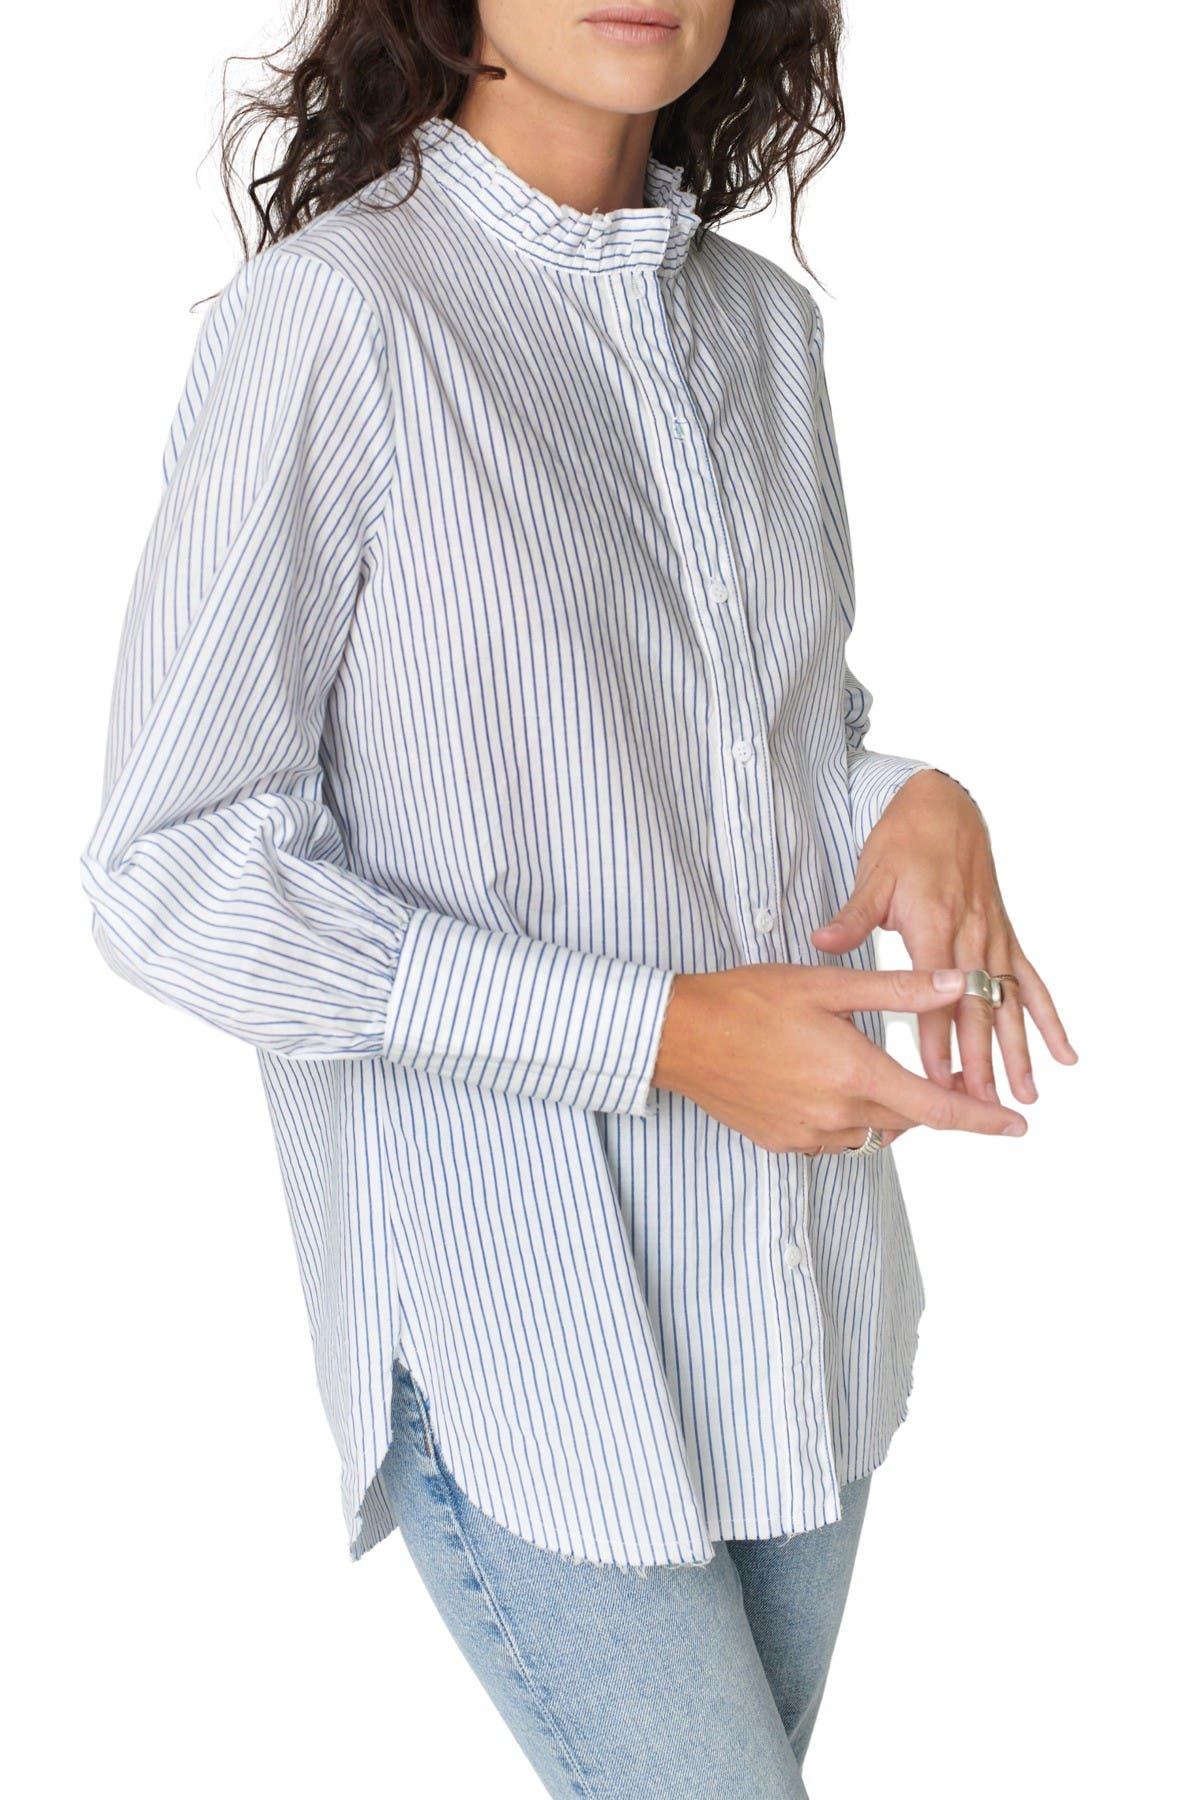 Image of Stateside Linen Ruffle Blouson Shirt